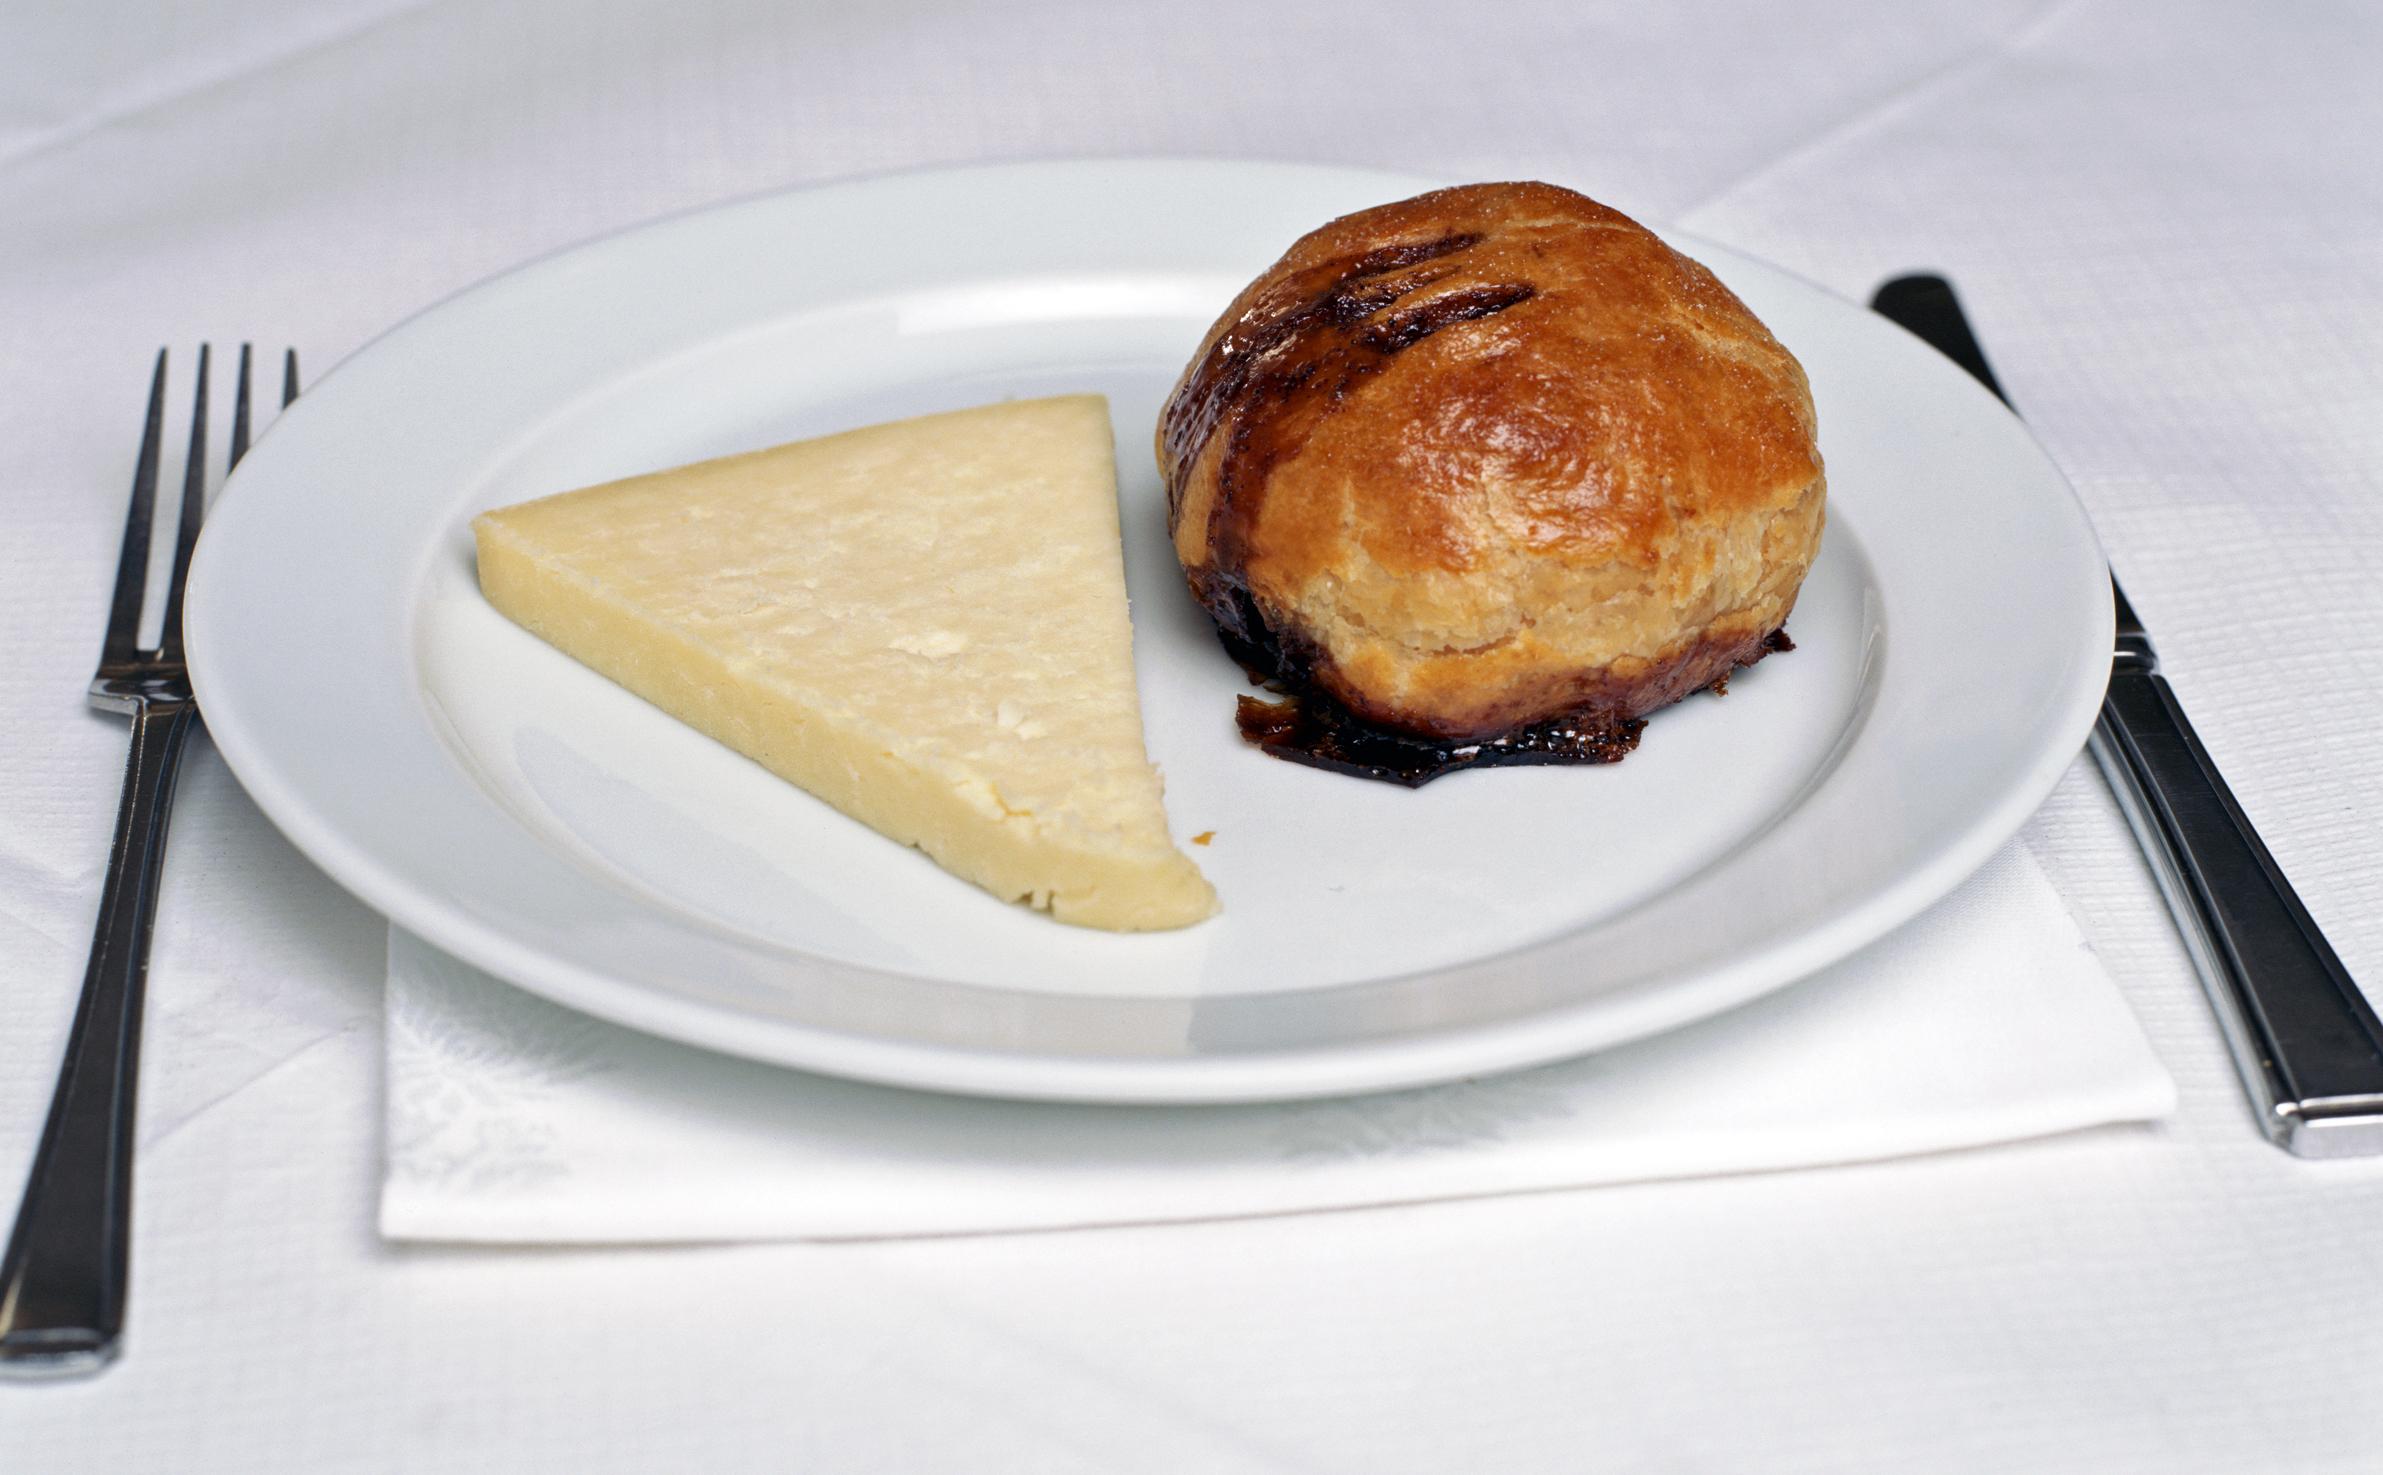 Salt Bae Is Opening a Steak Restaurant in London - Eater London